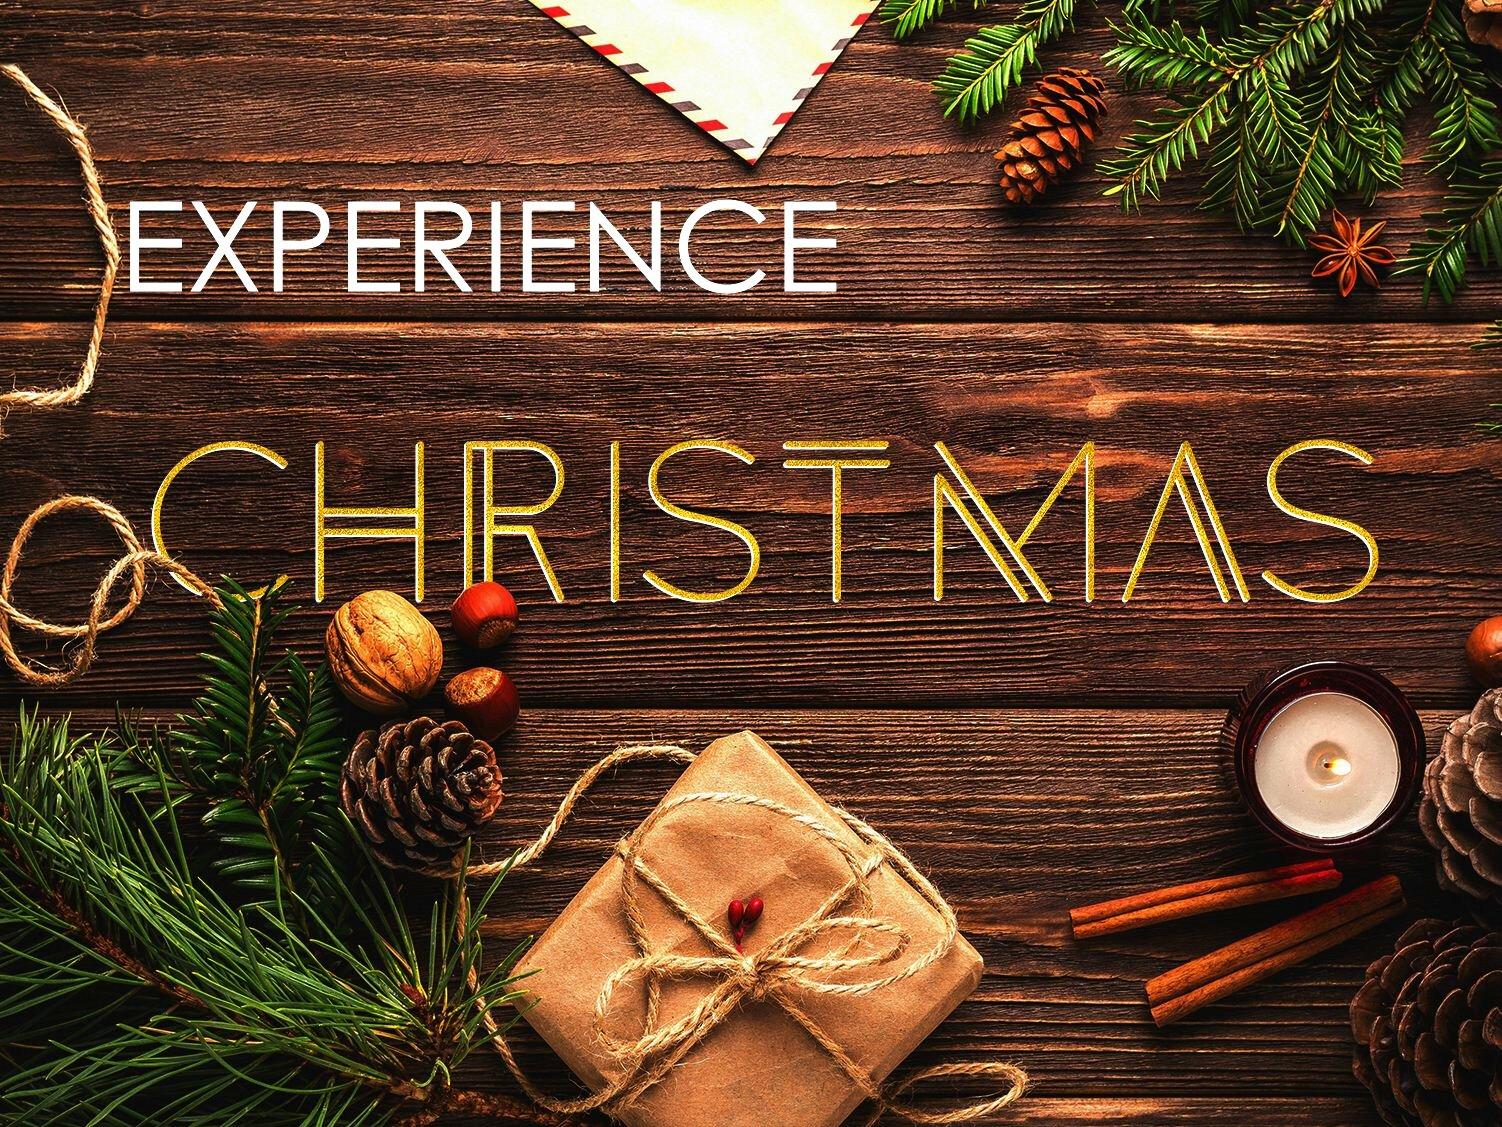 Exp-Christmas - theme.jpg